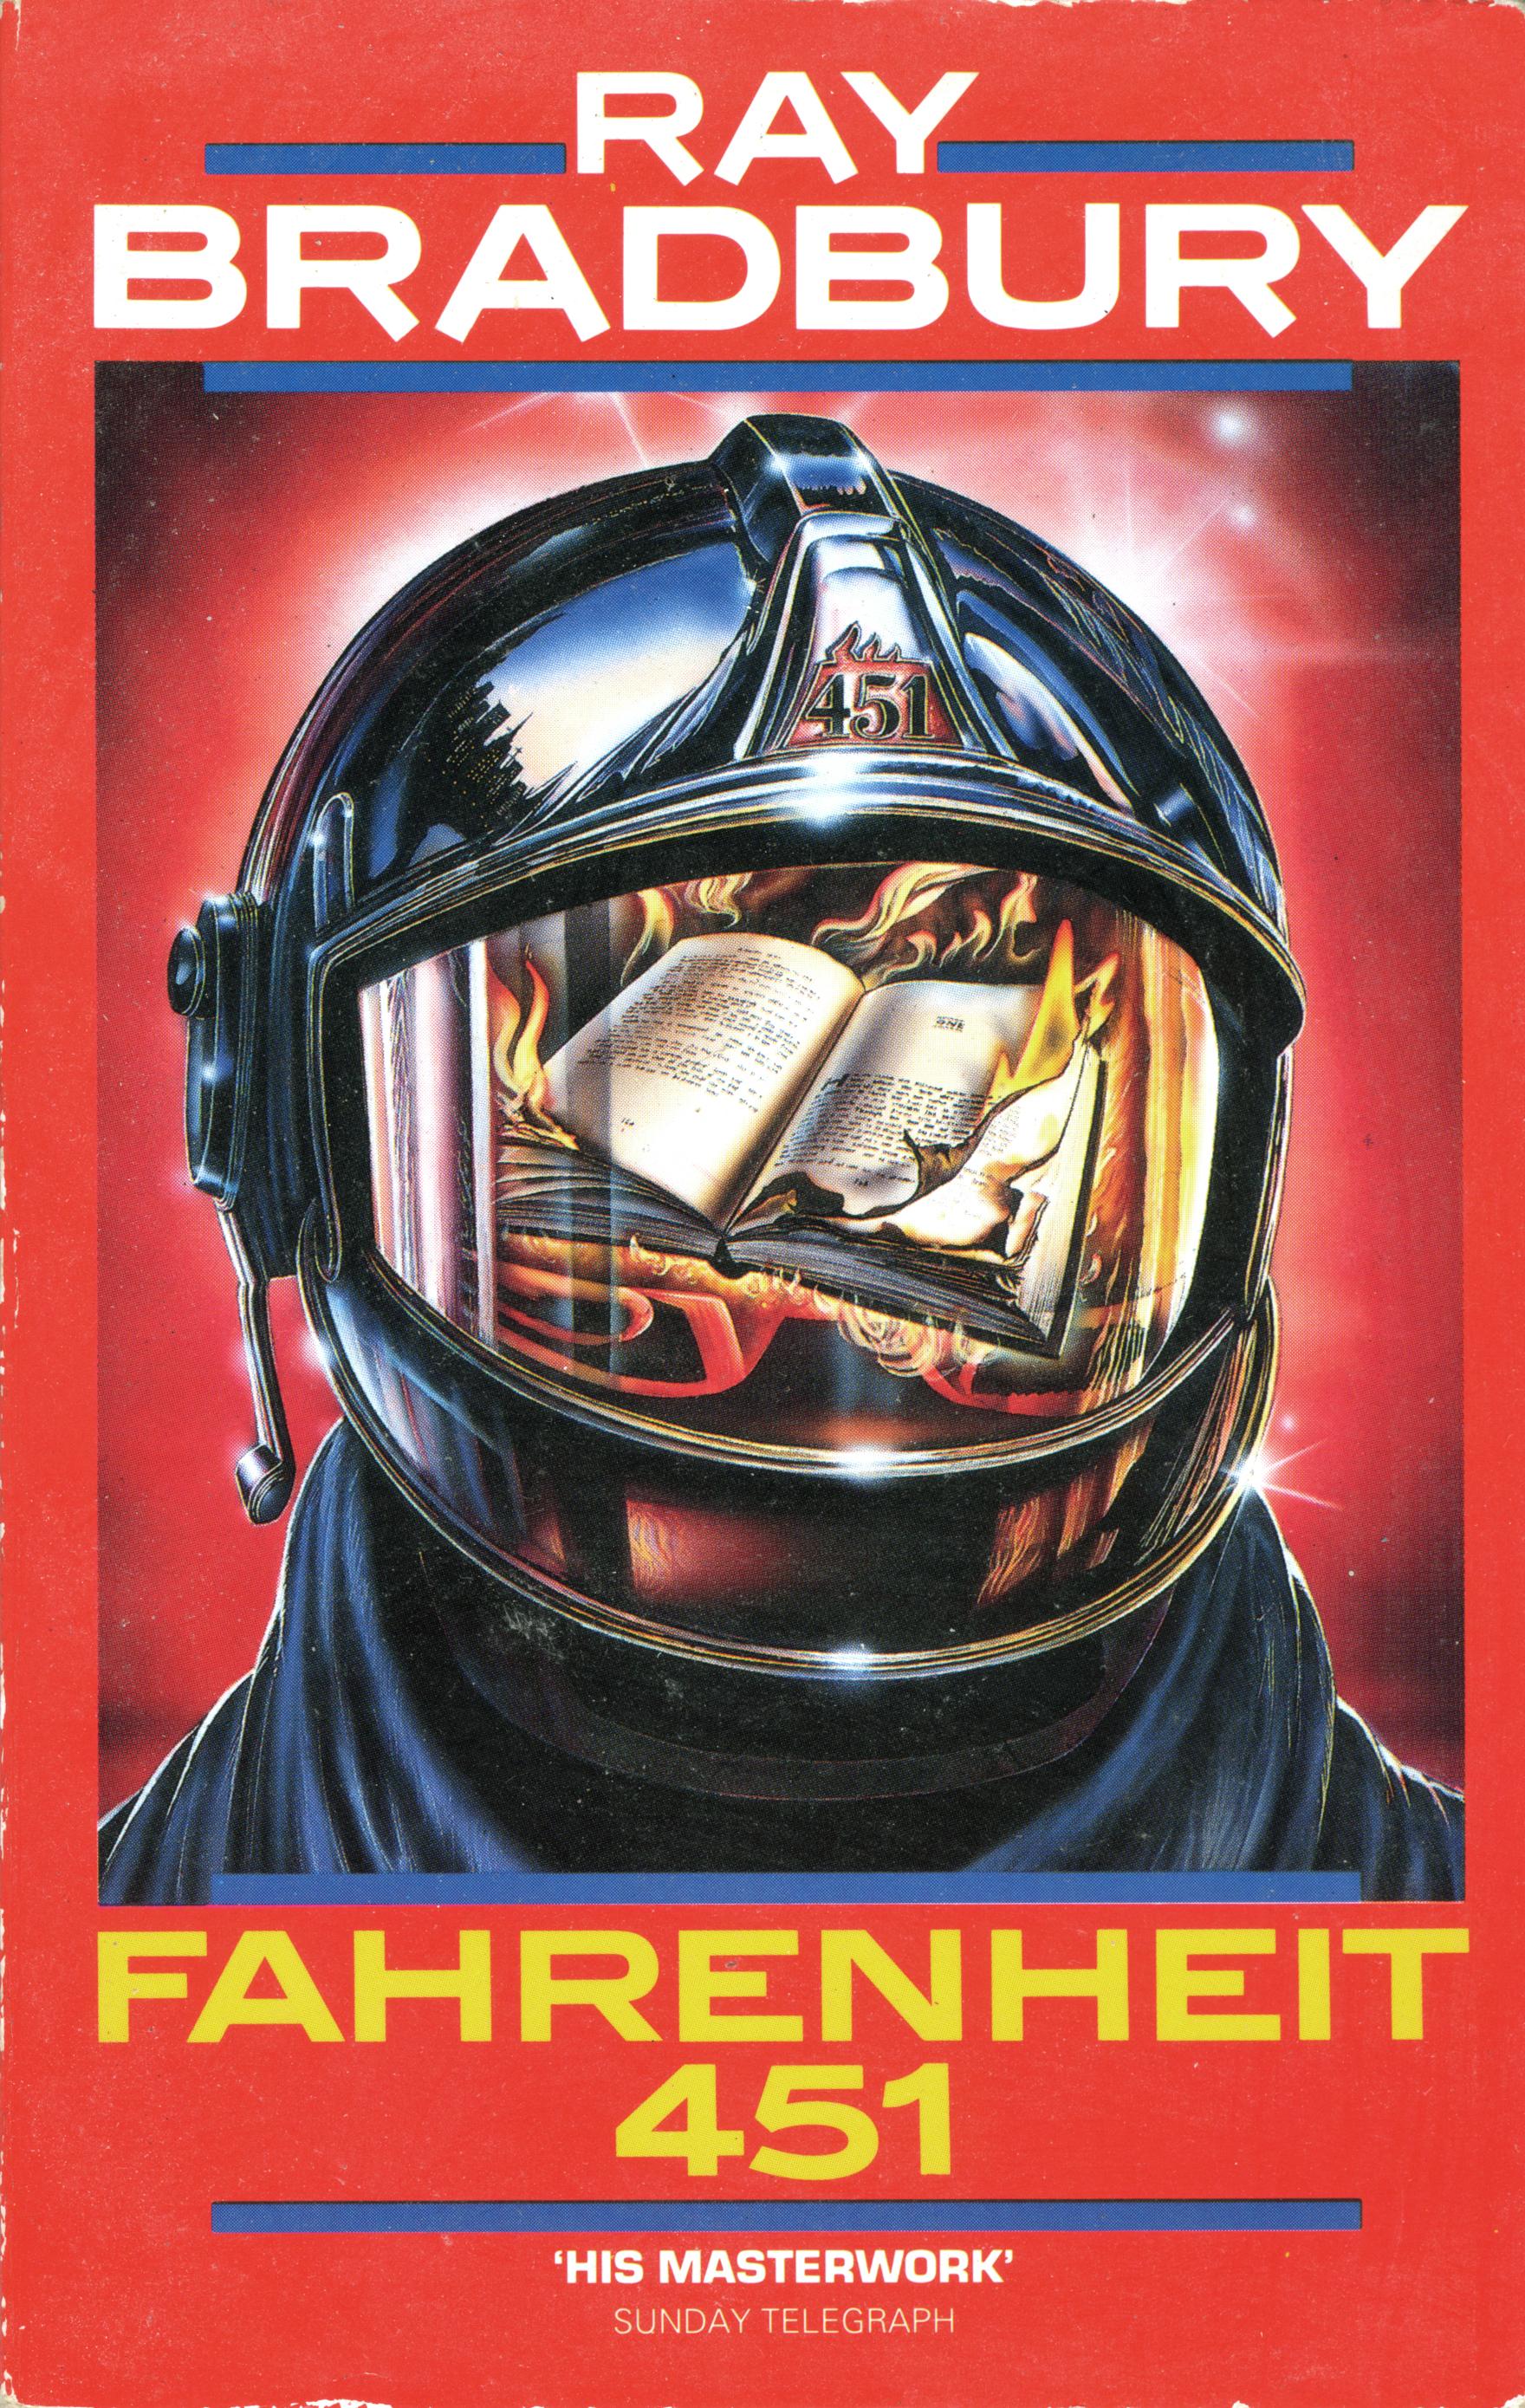 ray bradbury's novel fahrenheit 451 an The trouble with girls artist tim hamilton adapts a classic.